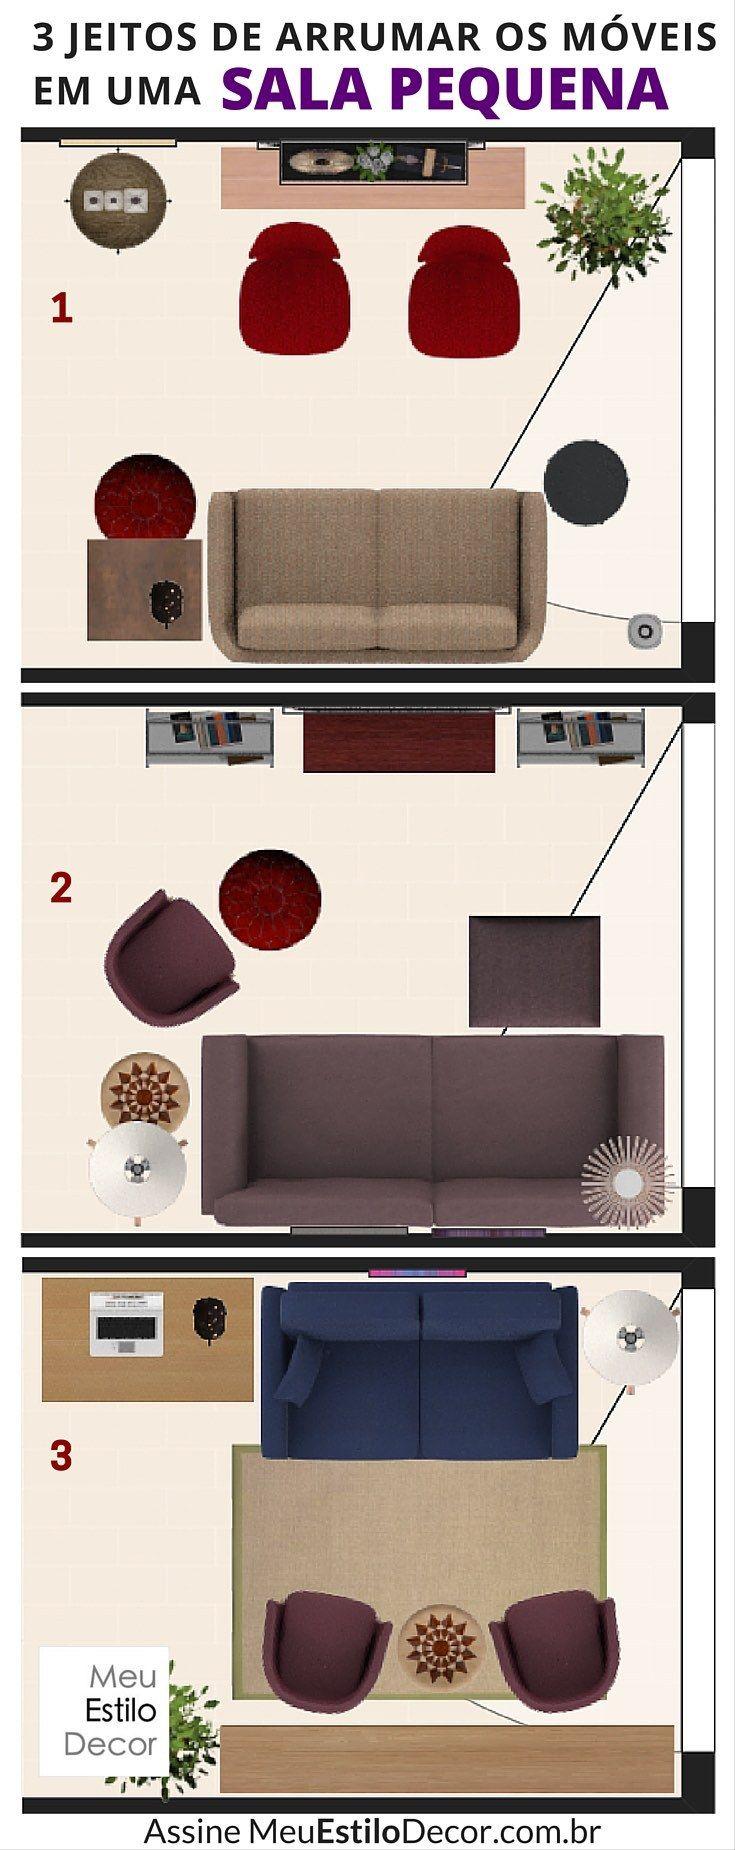 3-jeitos-arrumar-moveis-sala-pequena-infografico2